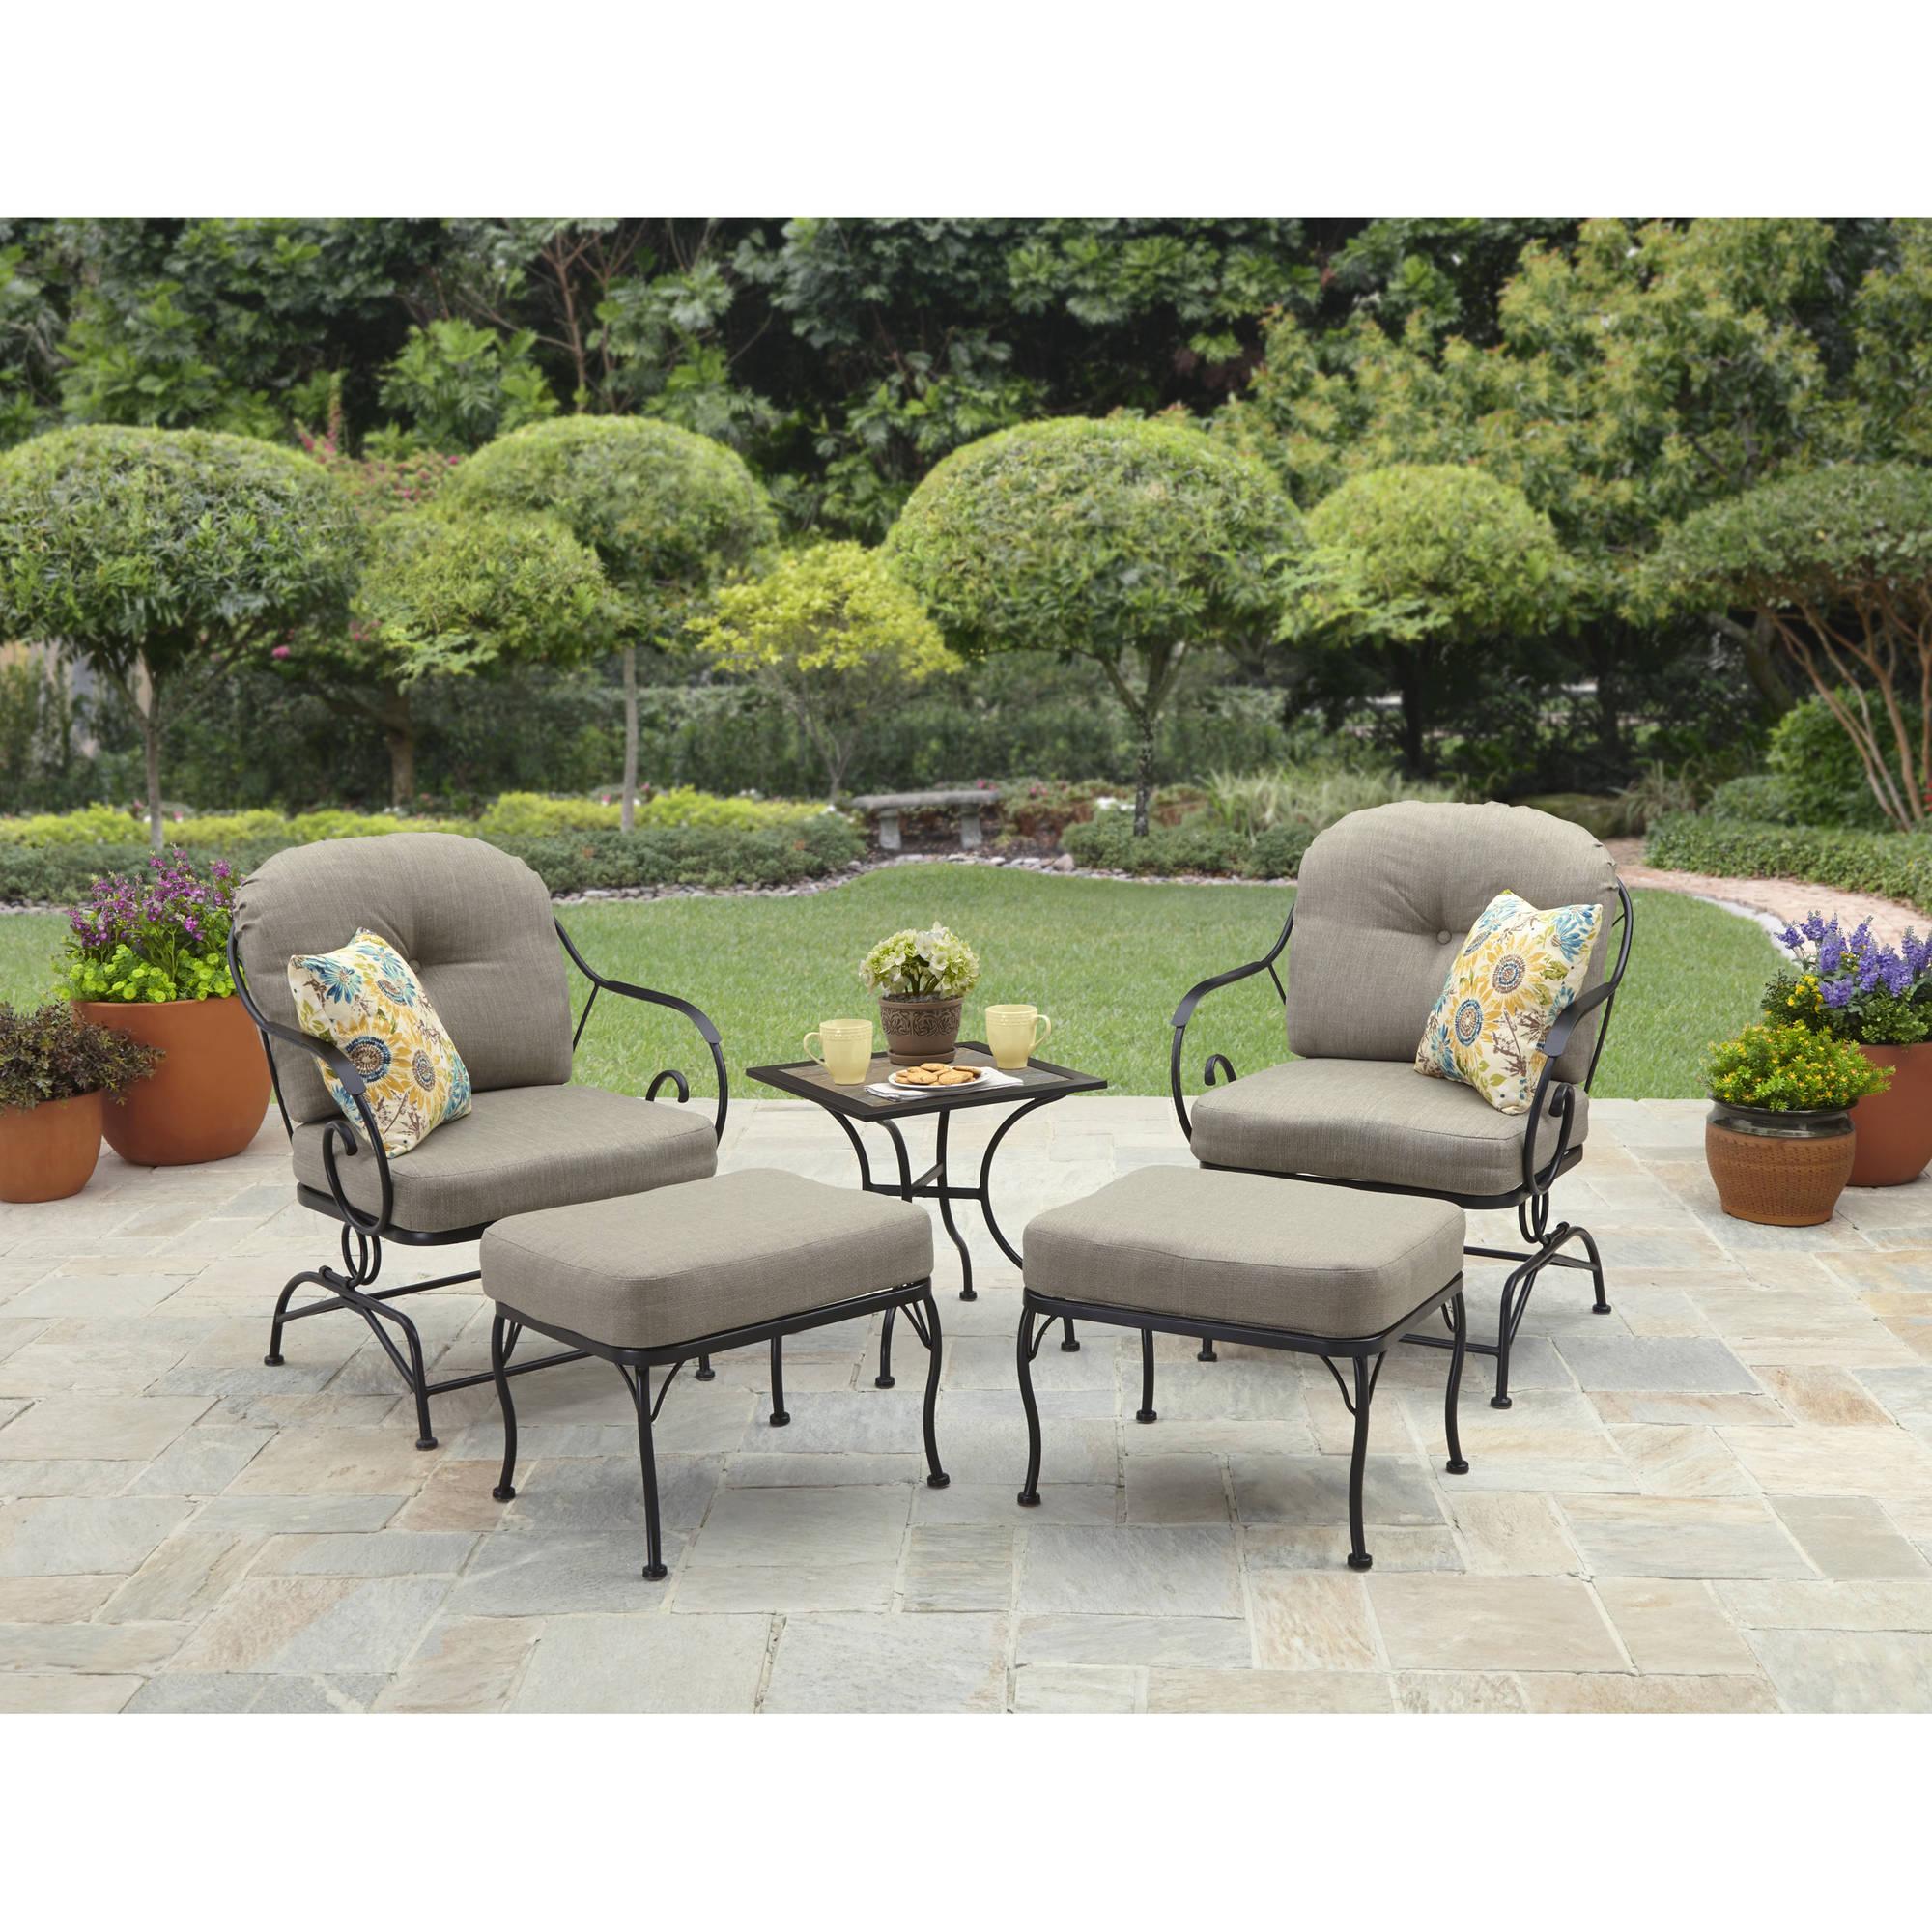 Better Homes and Gardens Myrtle Creek 5 Piece Outdoor Leisure Set